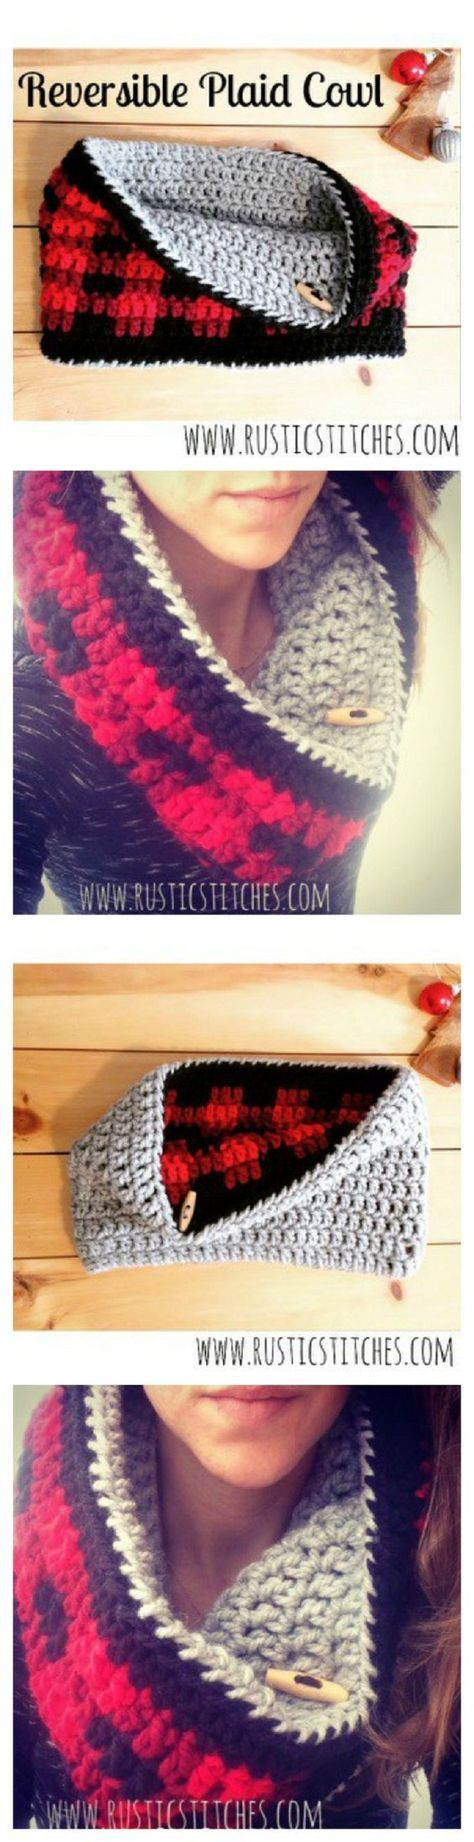 50 best fun projects images on Pinterest   Crochet patterns, Knit ...